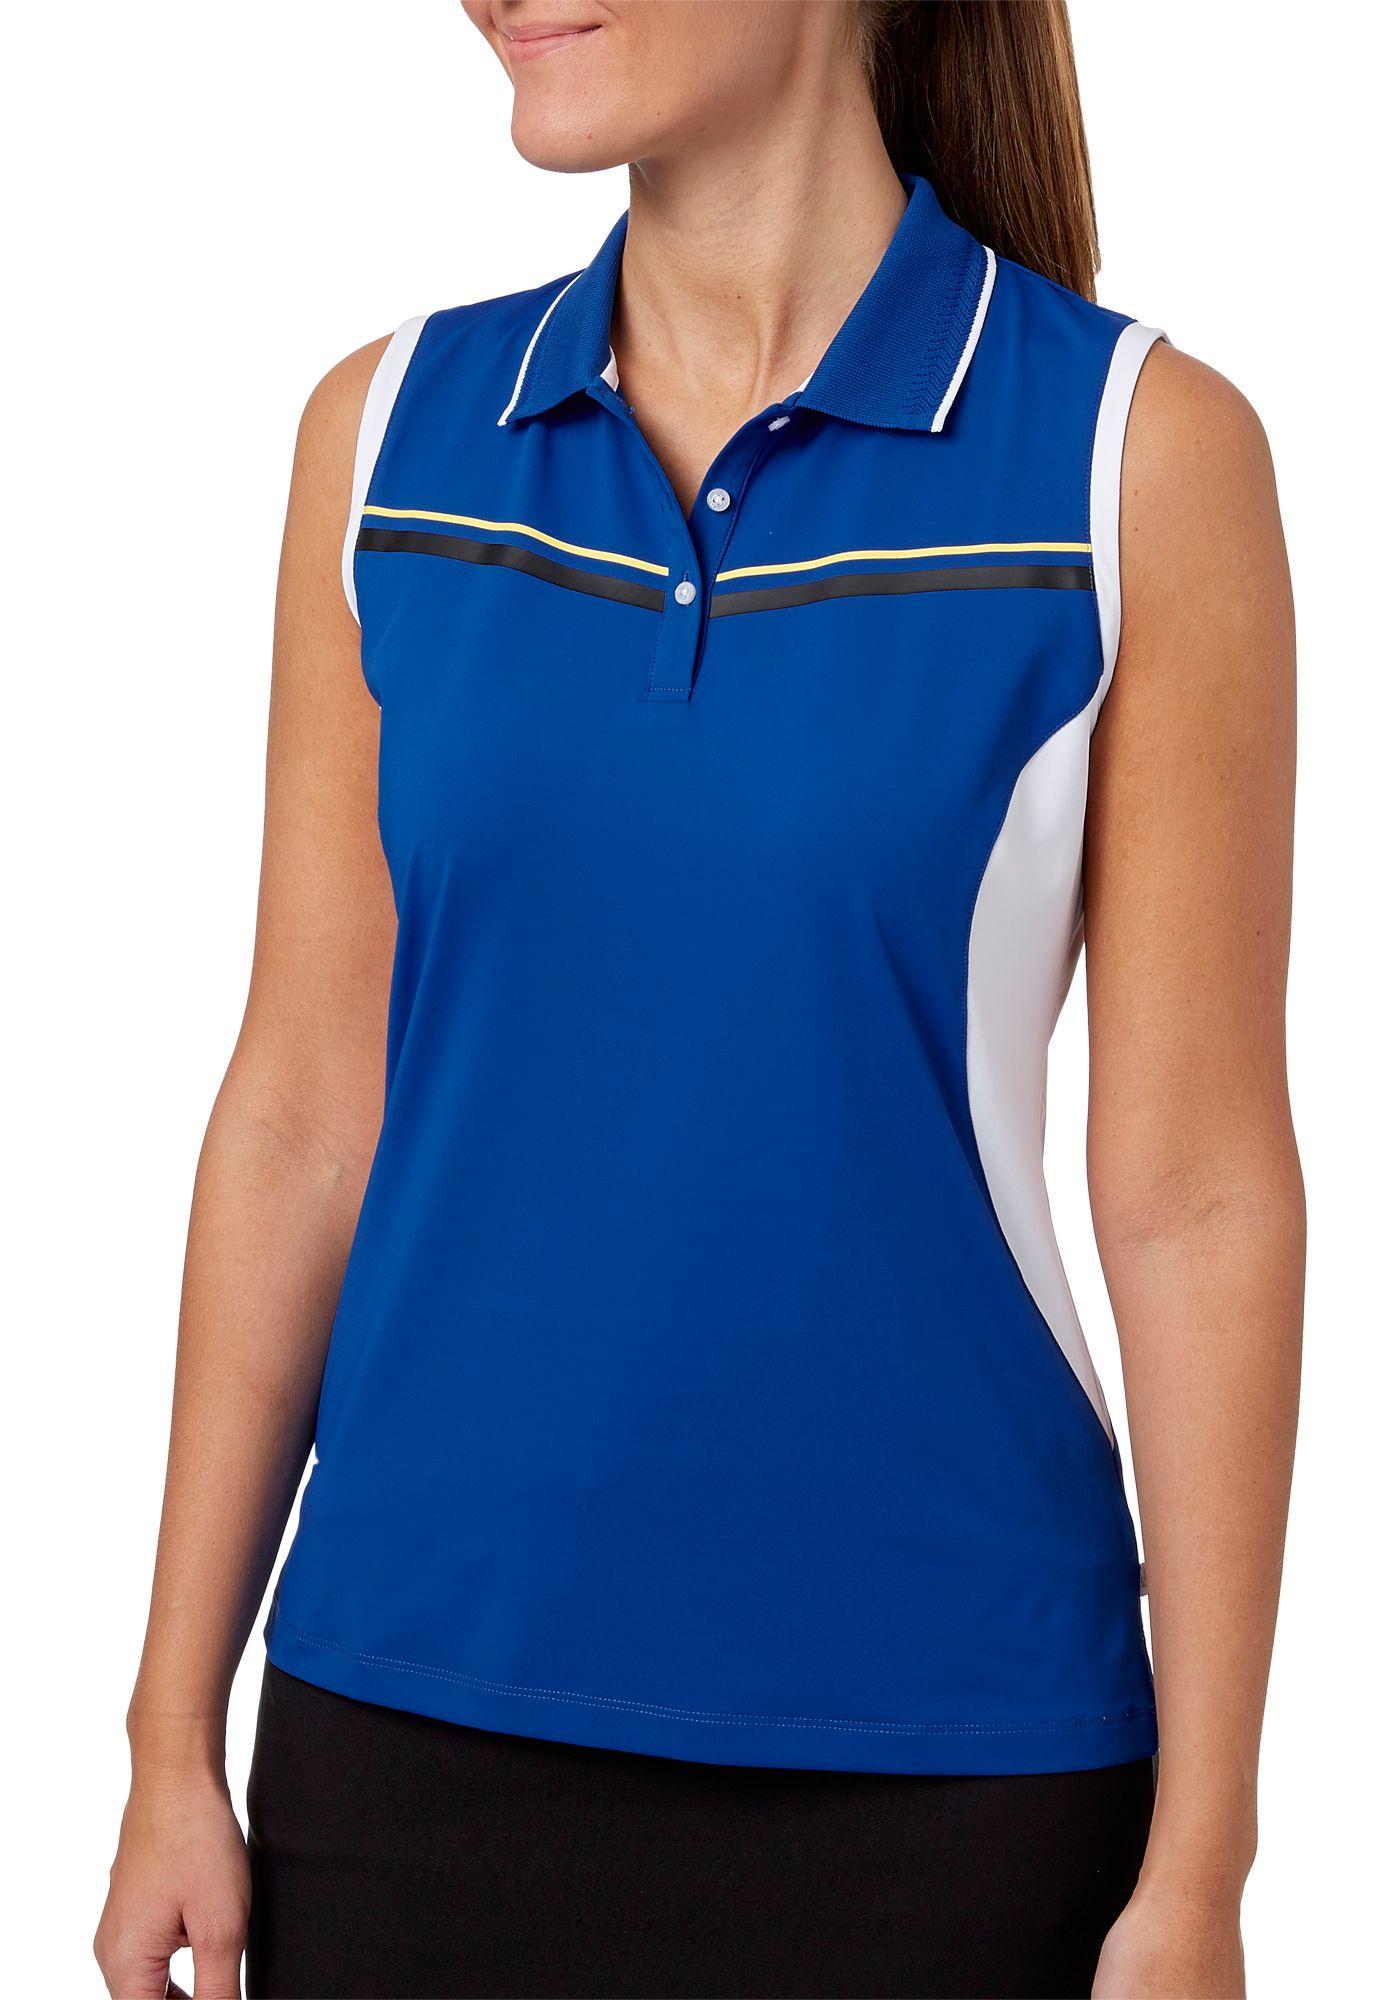 Lady Hagen Women's Winter's Night Collection Sleeveless Golf Polo